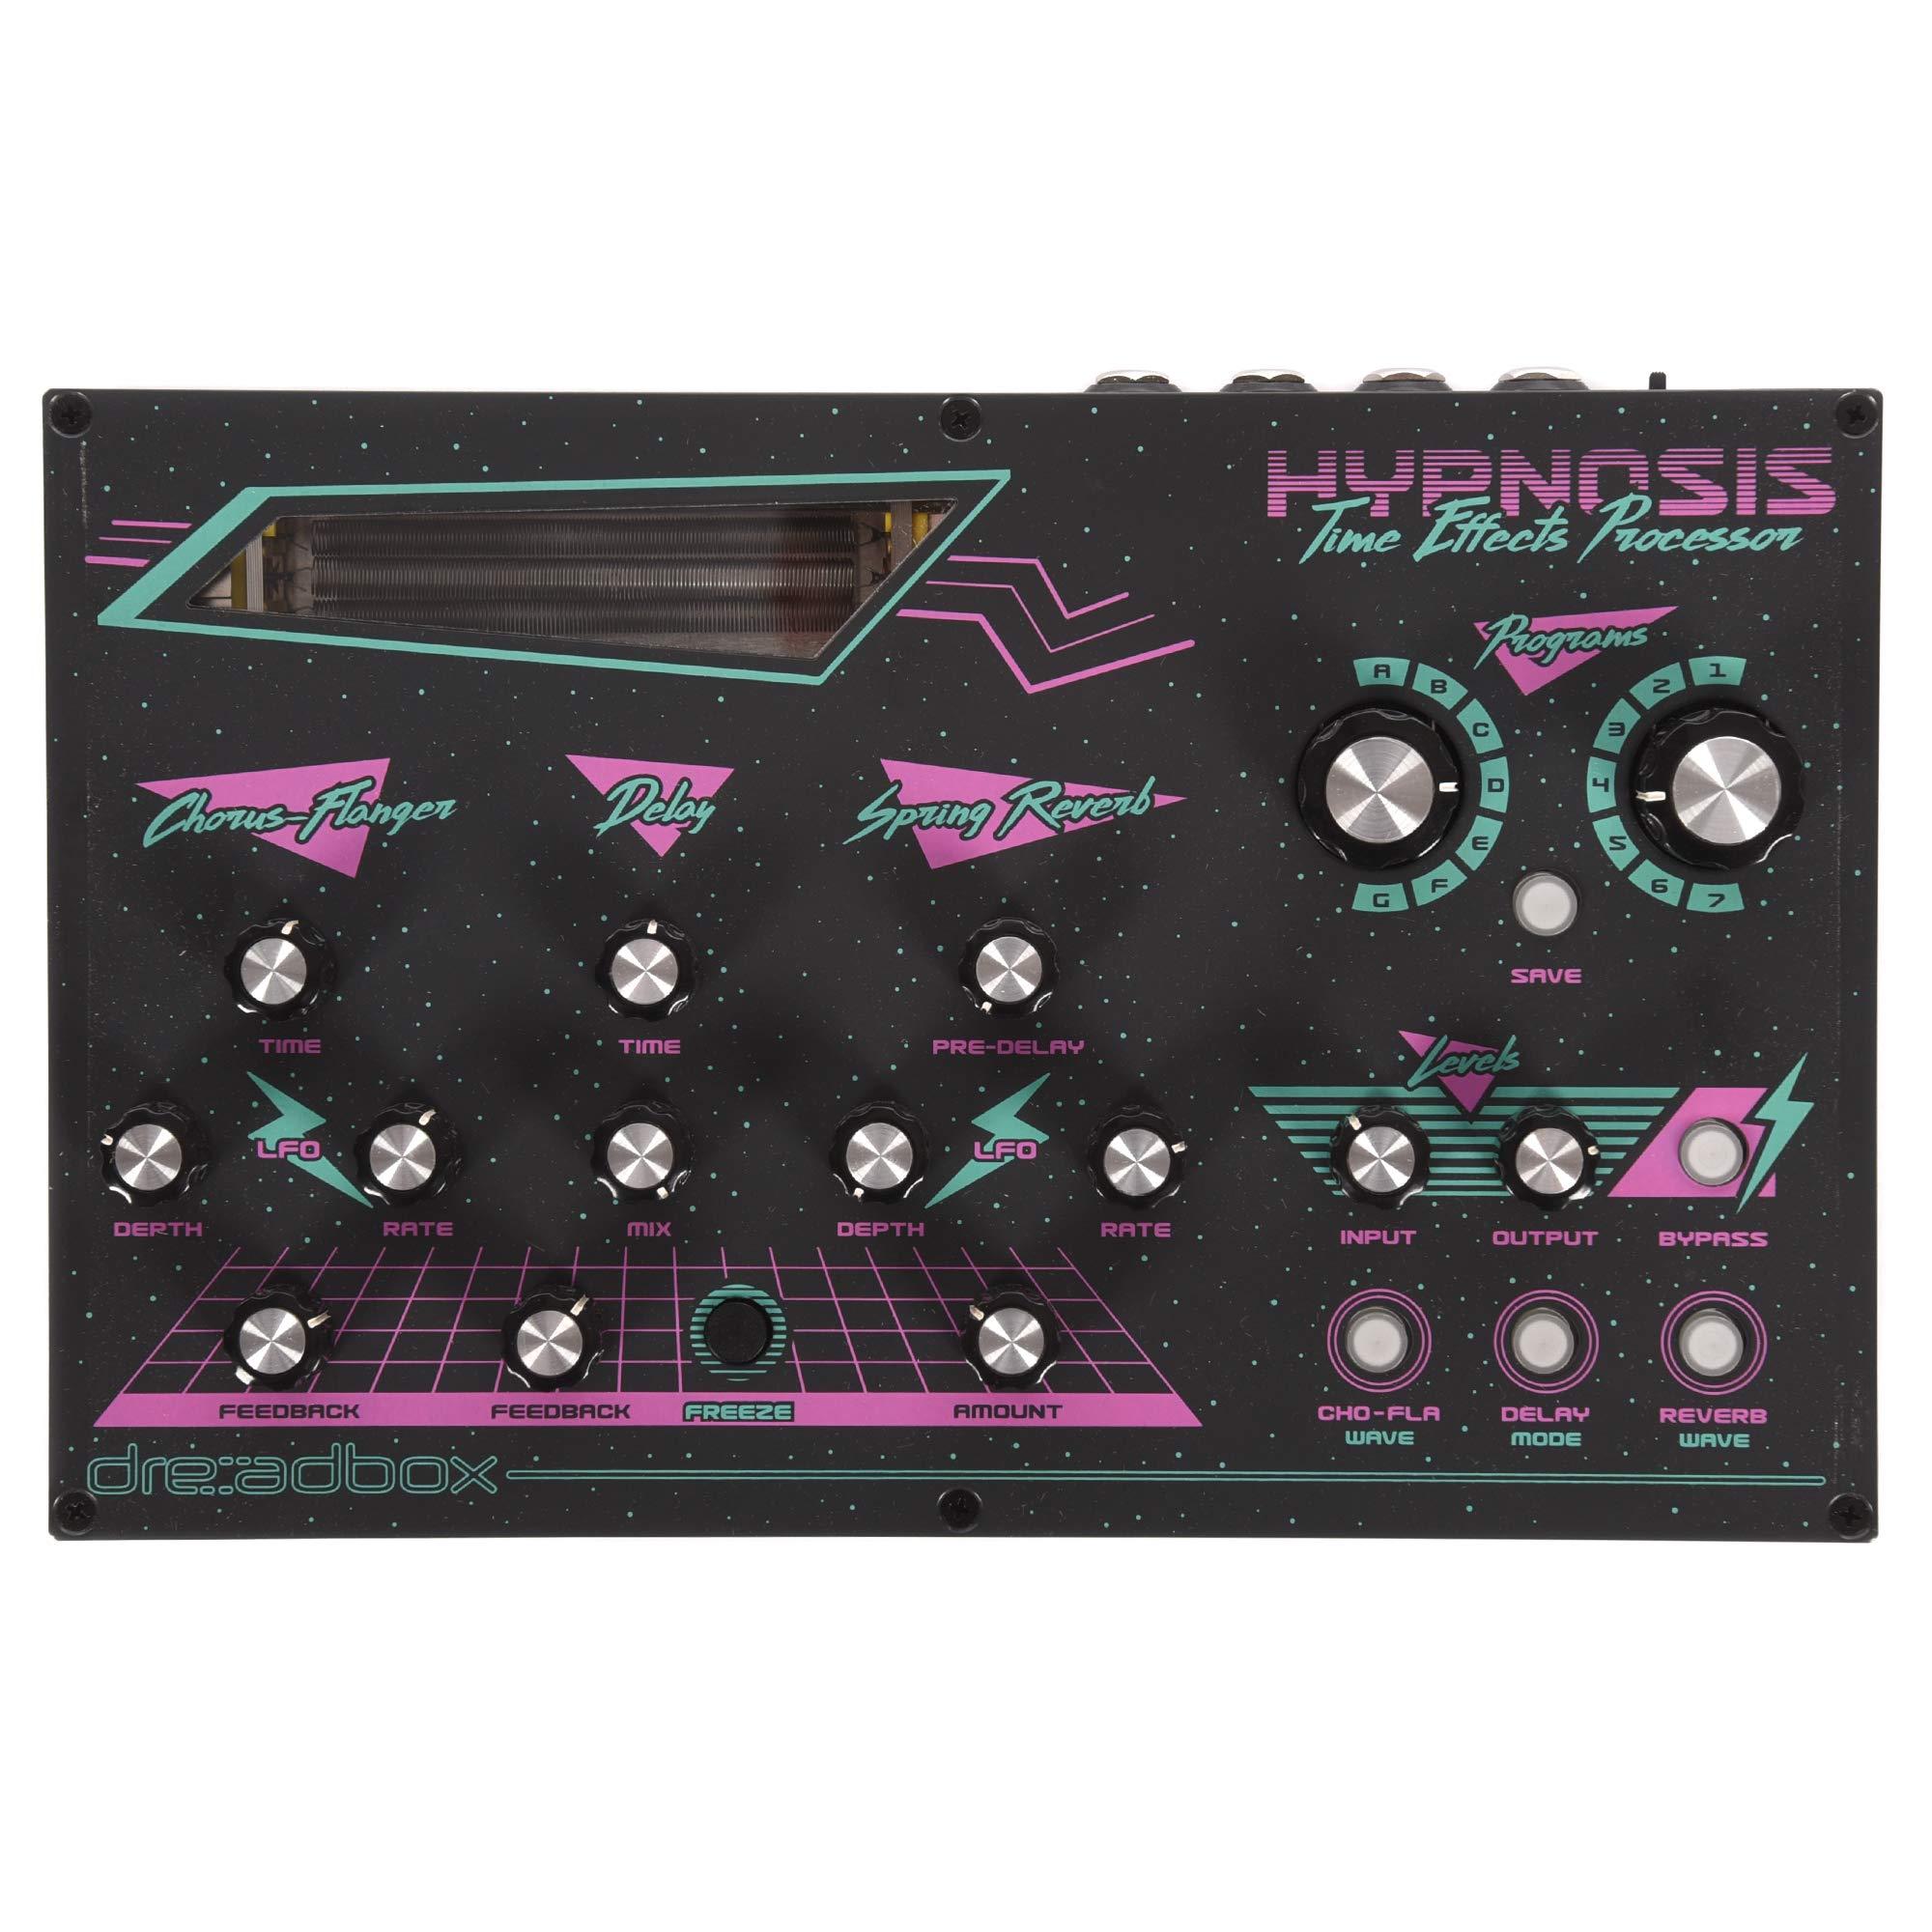 Dreadbox Hypnosis Time Effects Processor